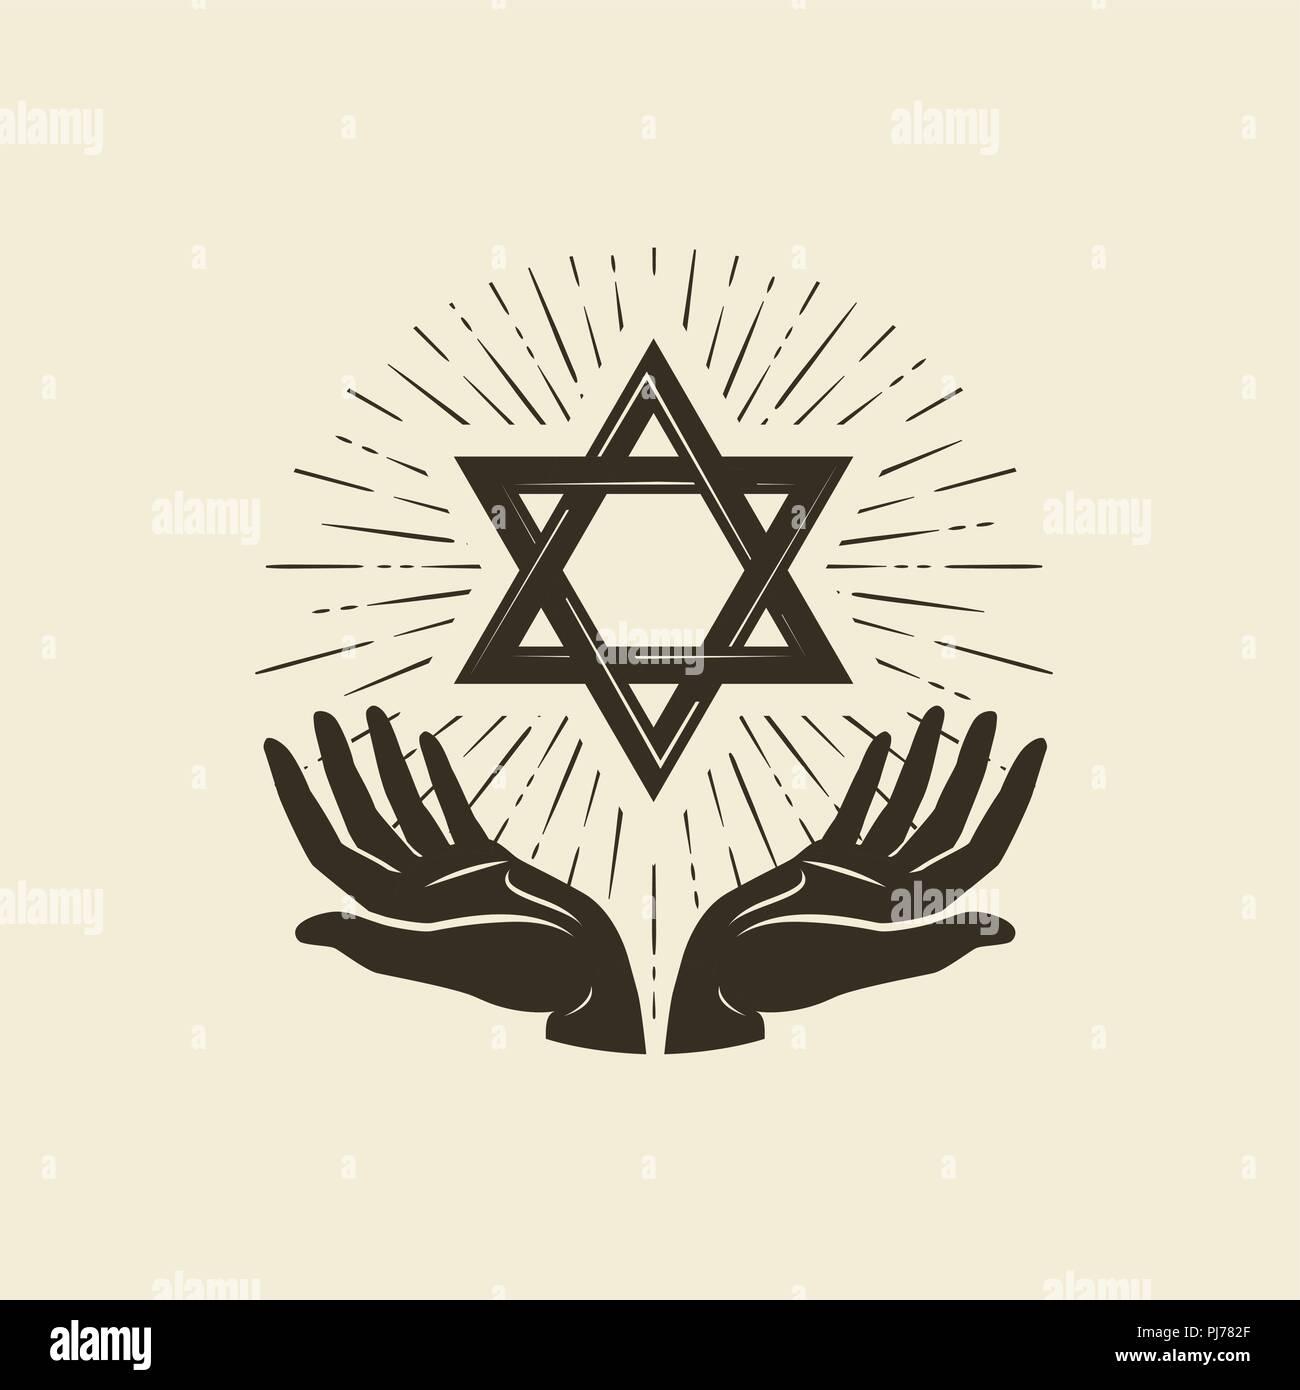 Star of David, symbol. Israel or Judaism emblem. Vector illustration - Stock Image